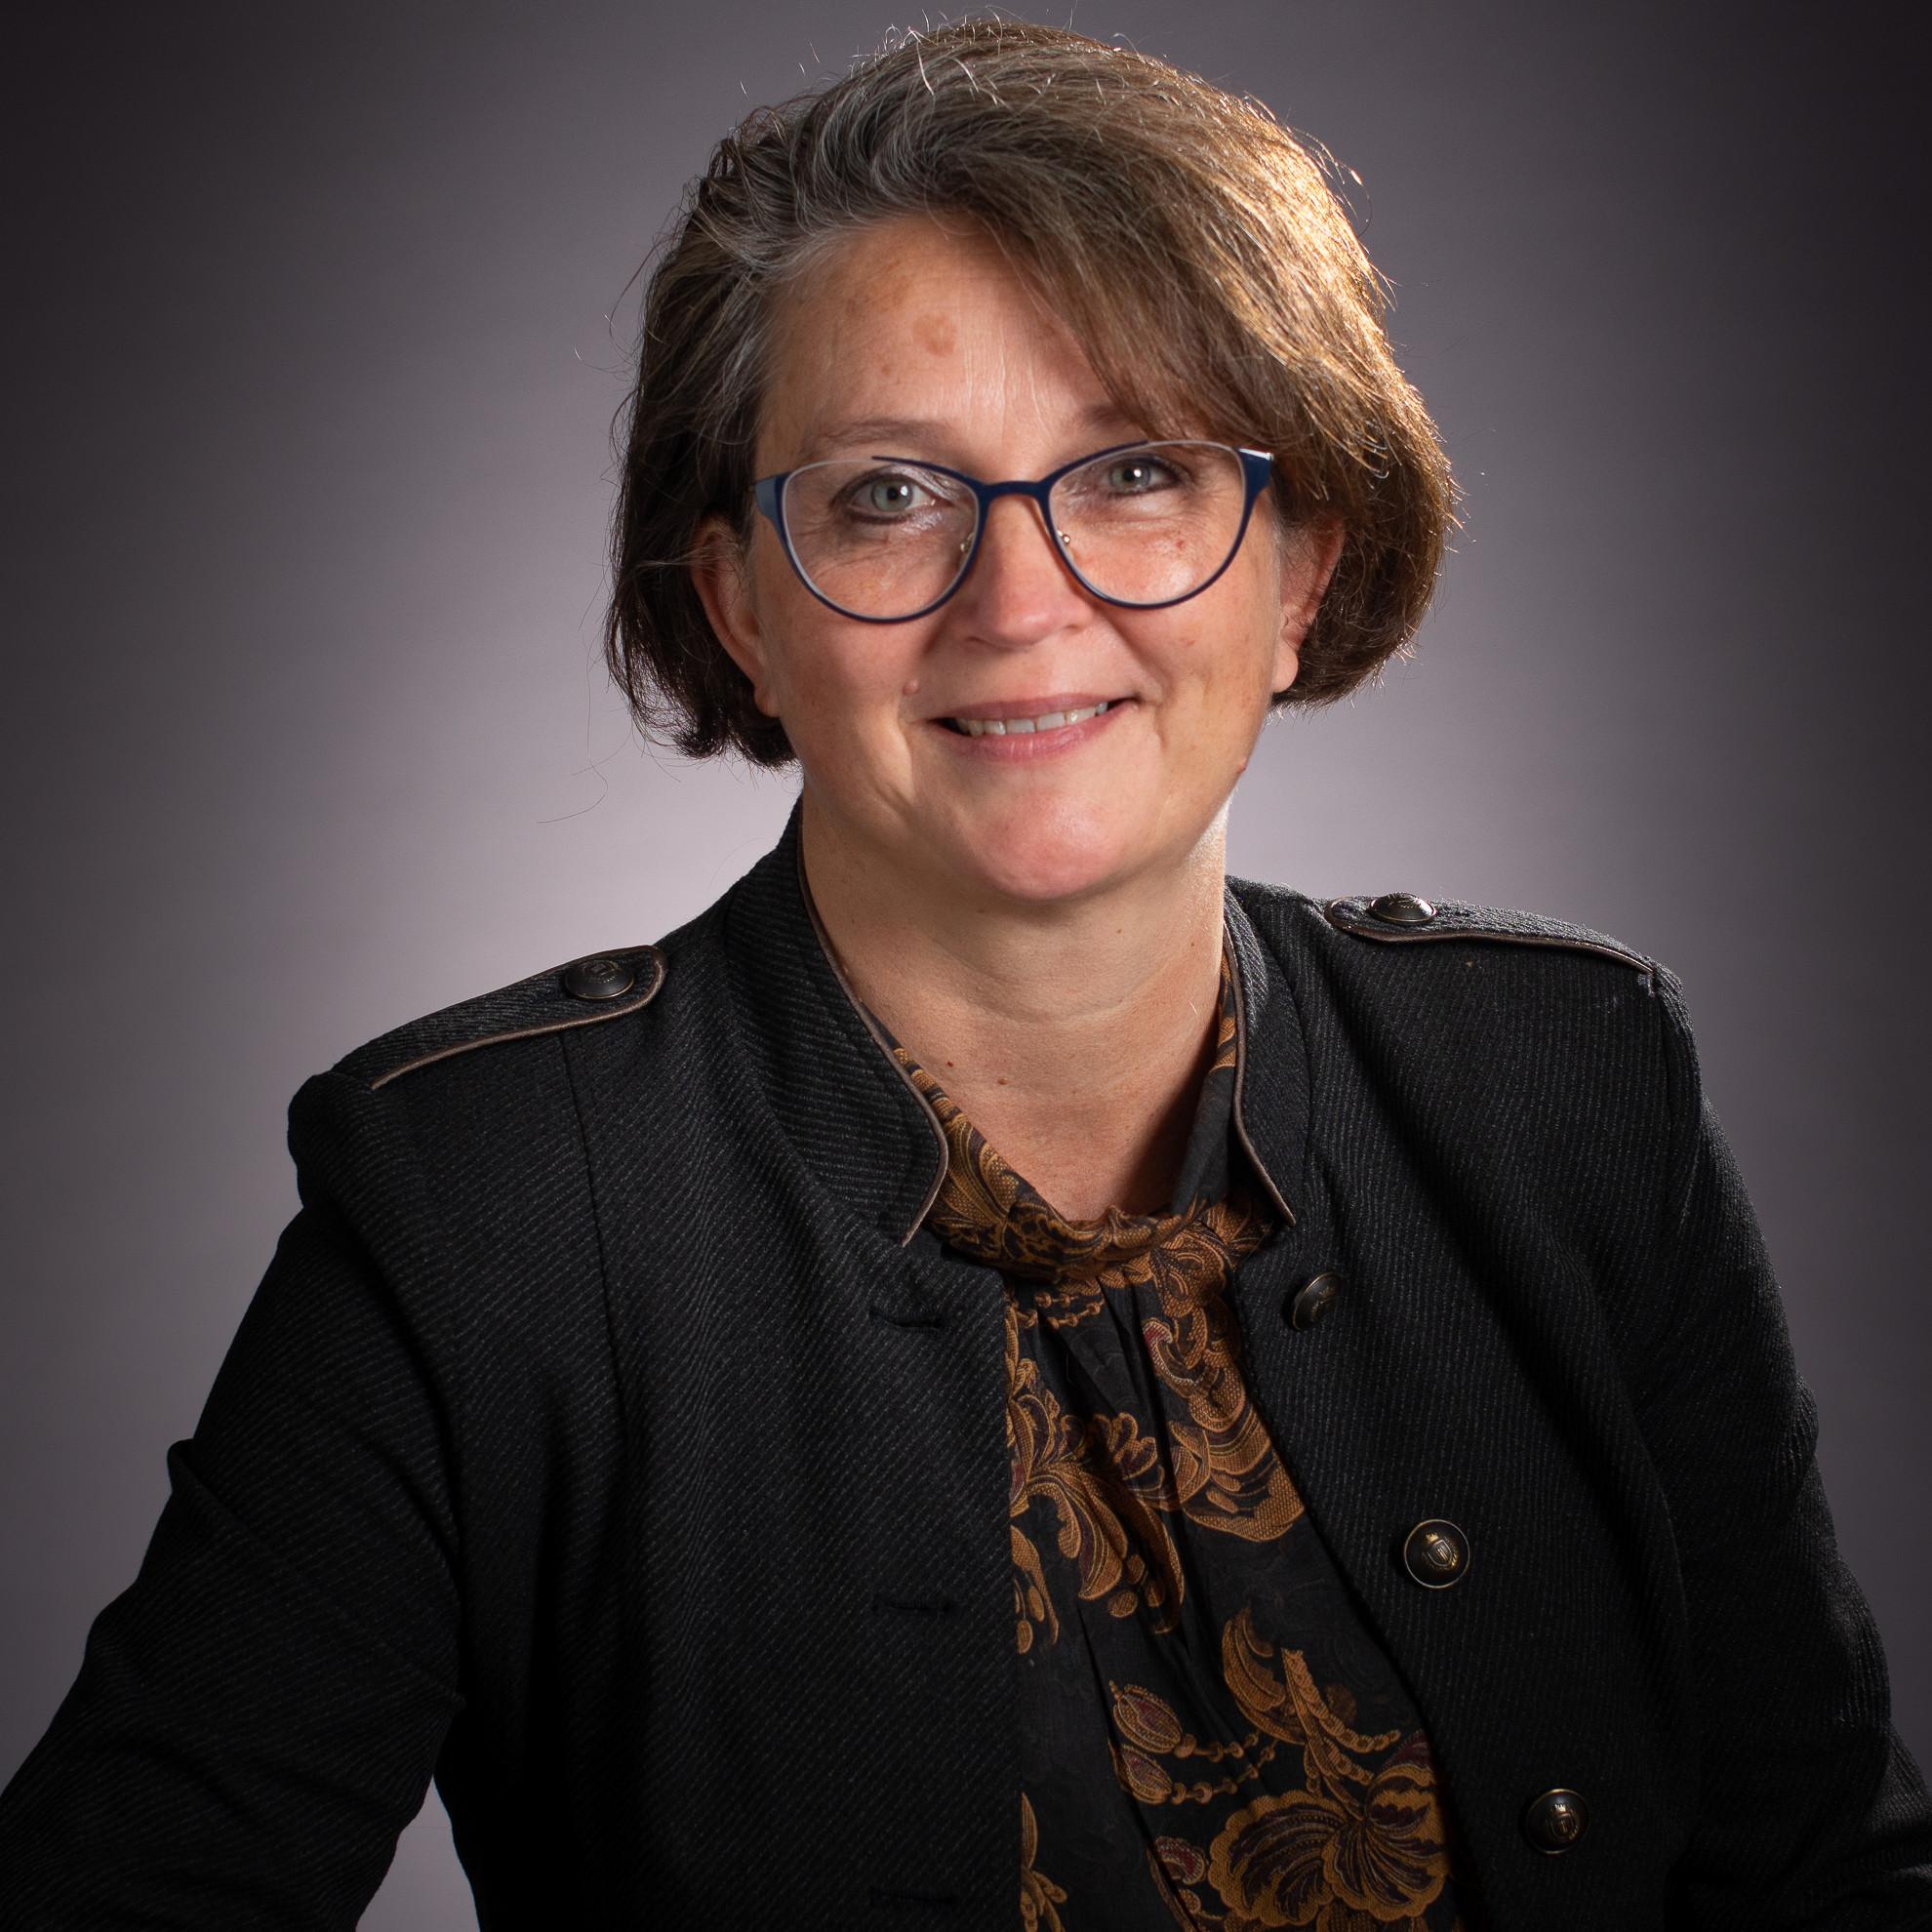 Ilona Anthonise-Gieling; advocaat Goes; Zeeland